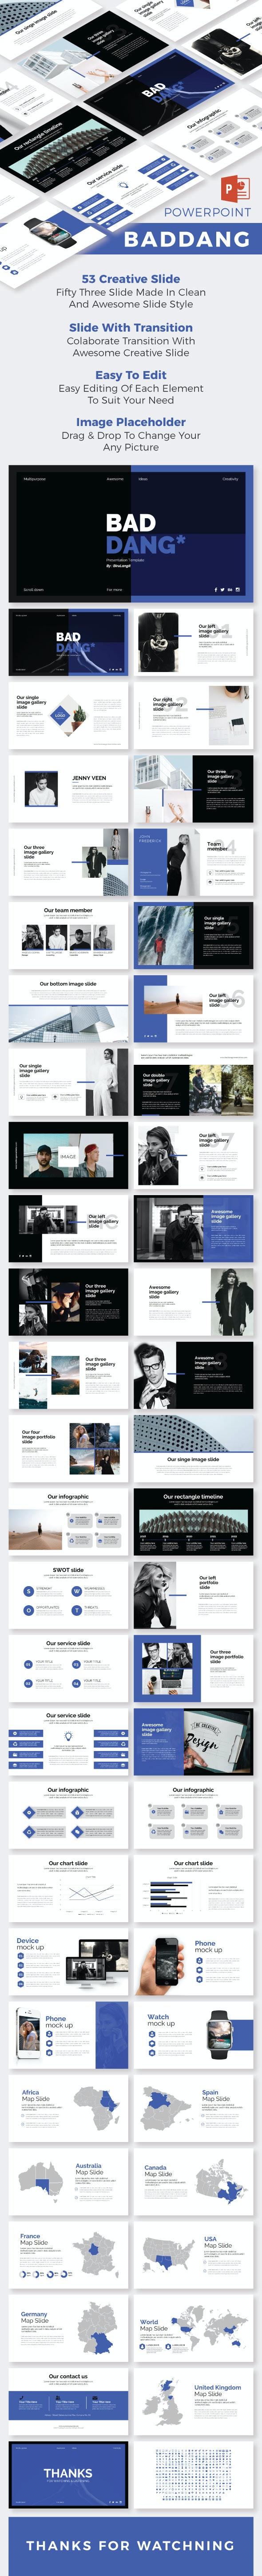 Baddang PowerPoint Temp - Creative PowerPoint Templates